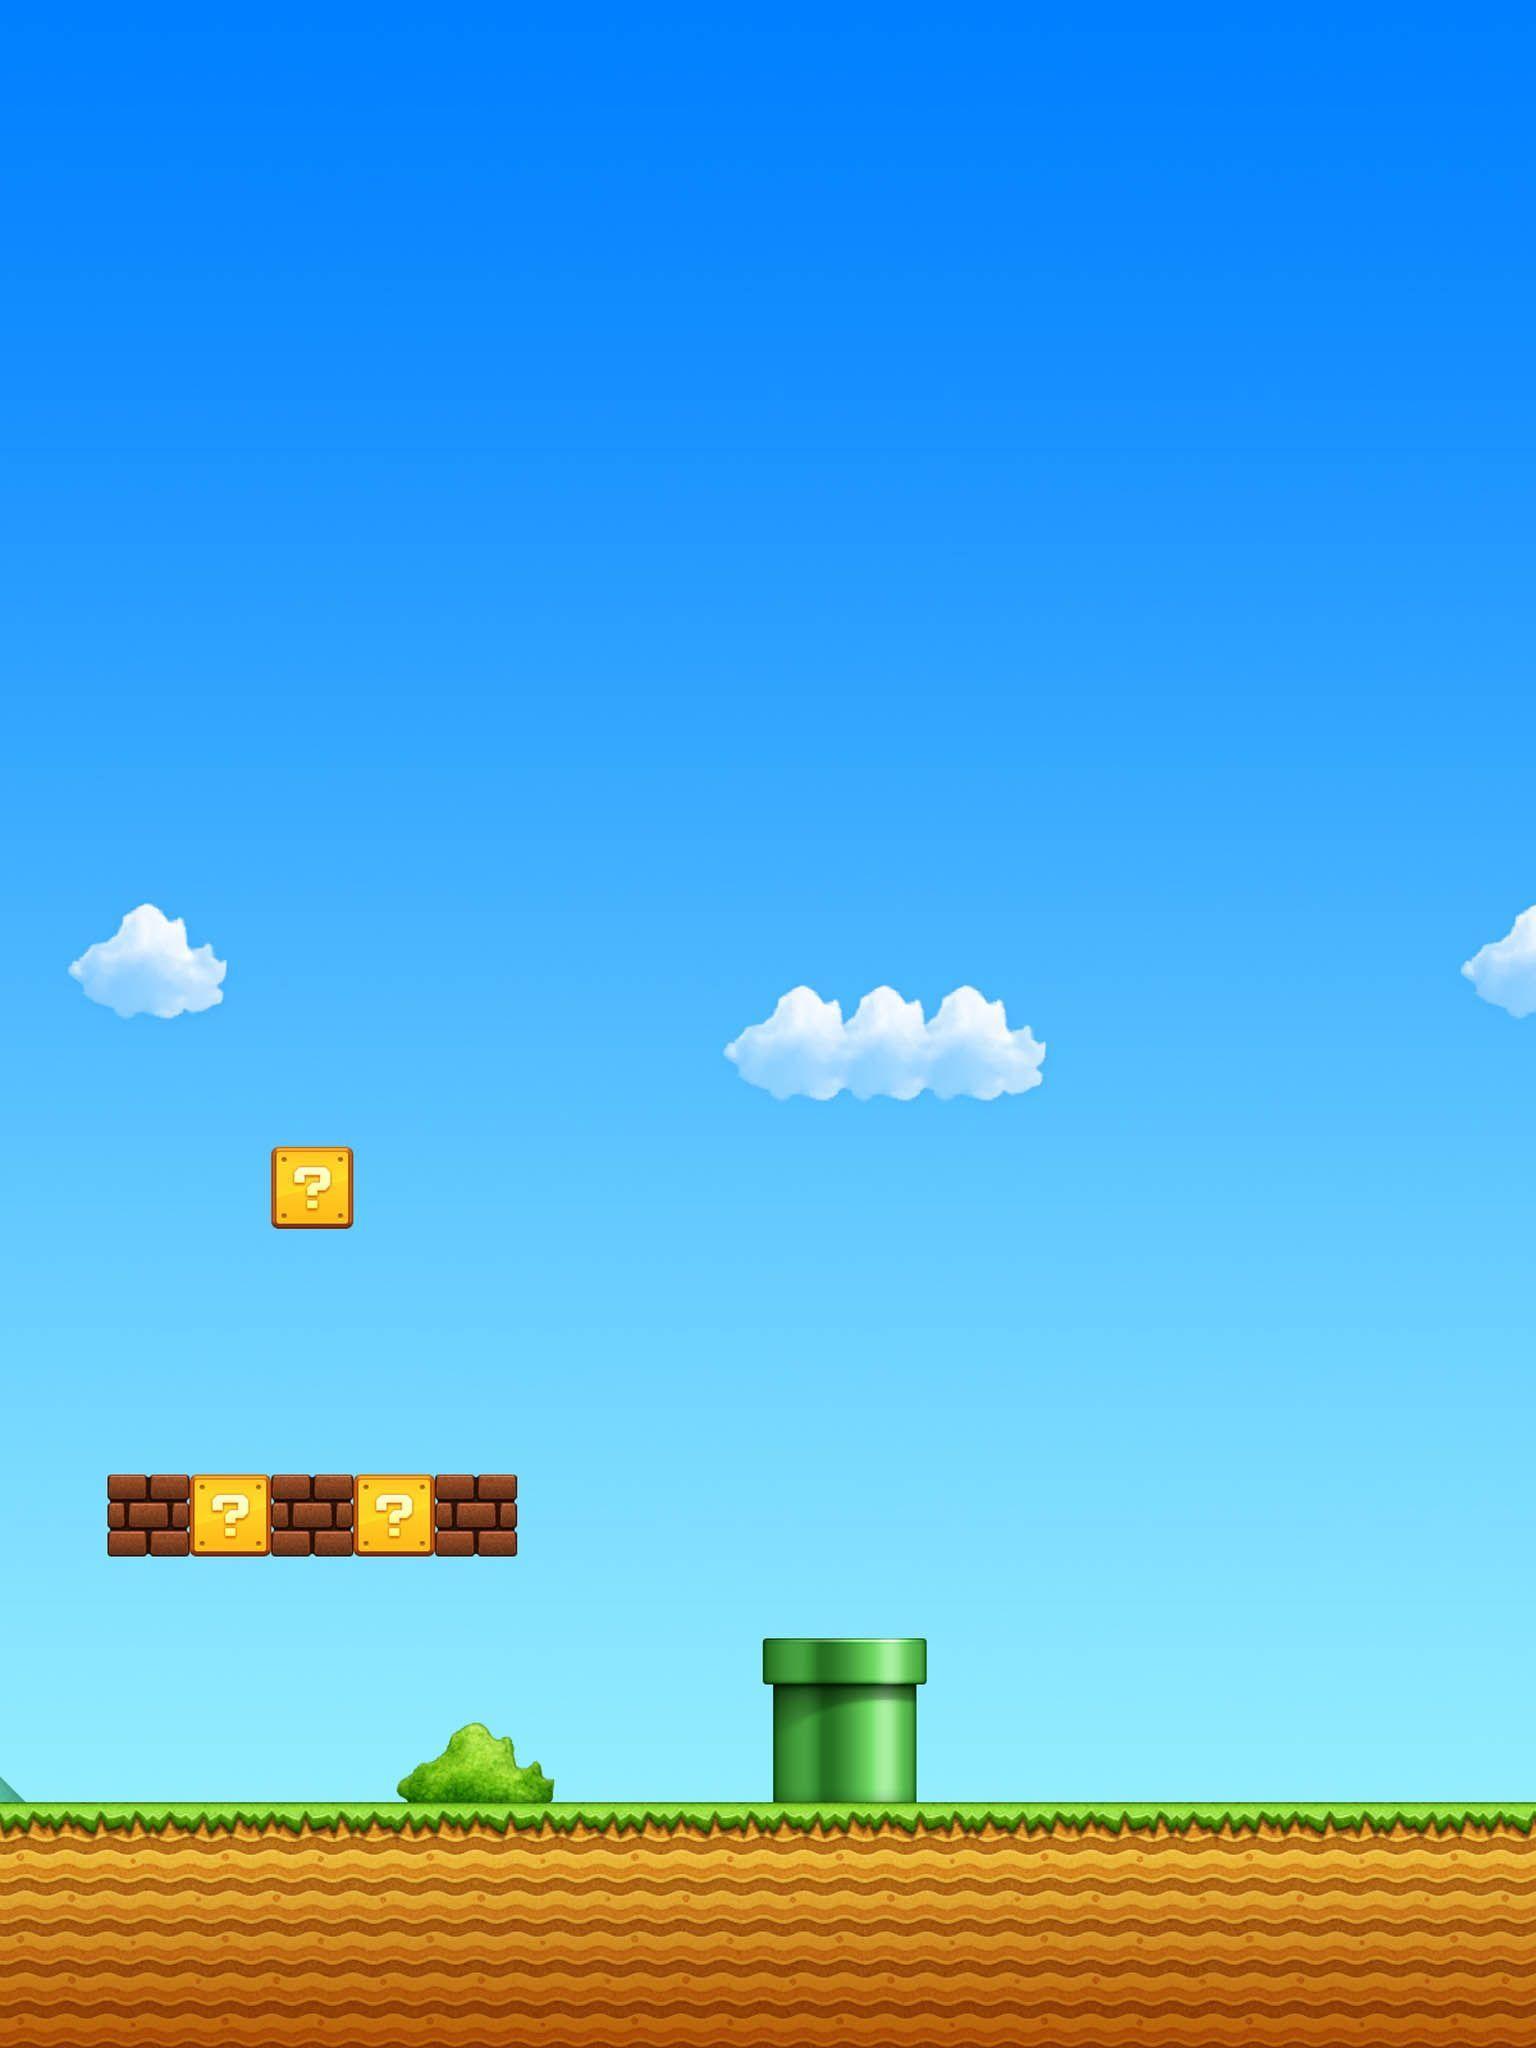 Super Mario Iphone Wallpapers Top Free Super Mario Iphone